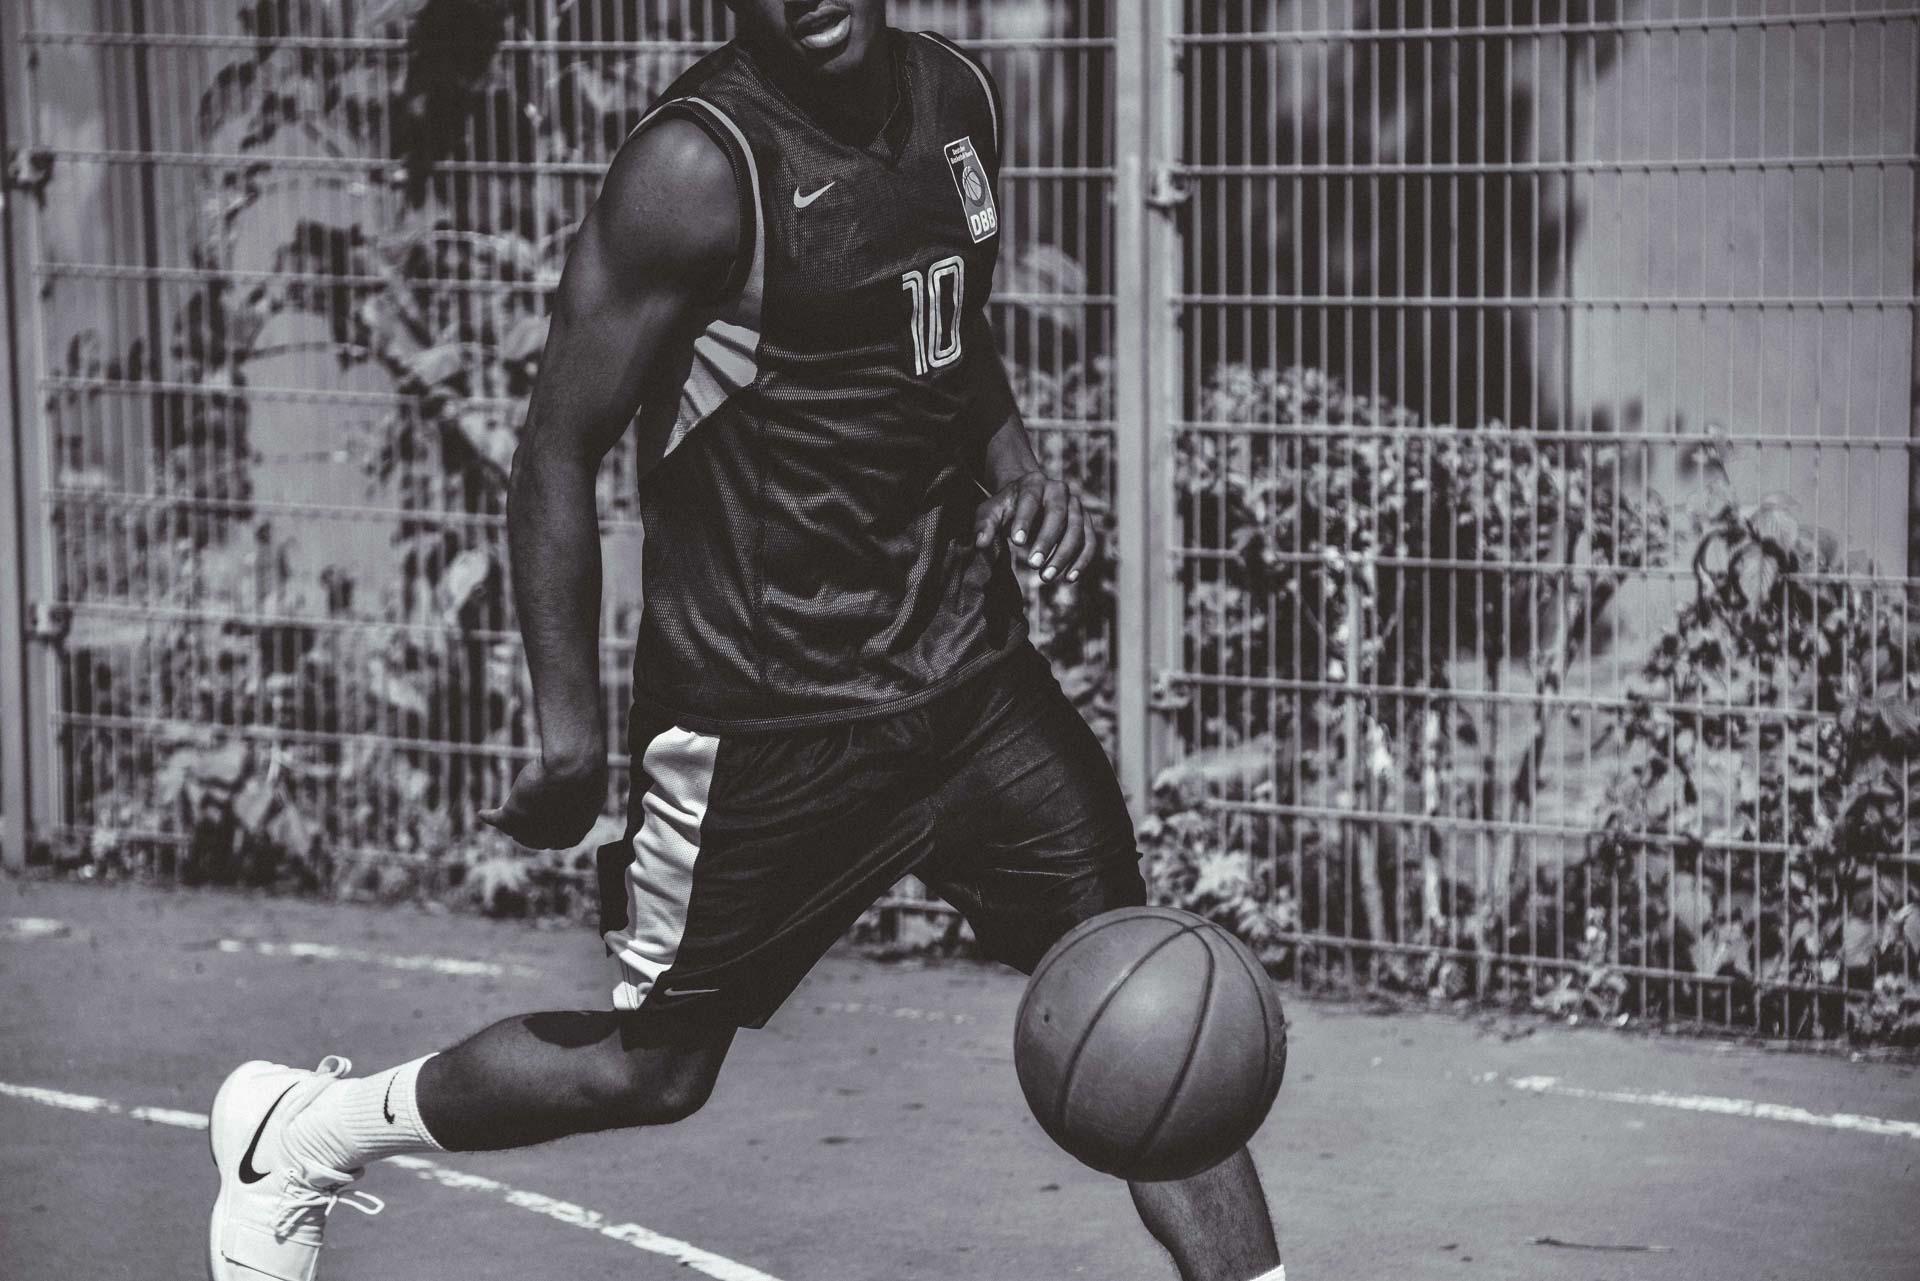 Nike Basketball – Sven Hoffmann Sport Fotograf Berlin (7 von 14)